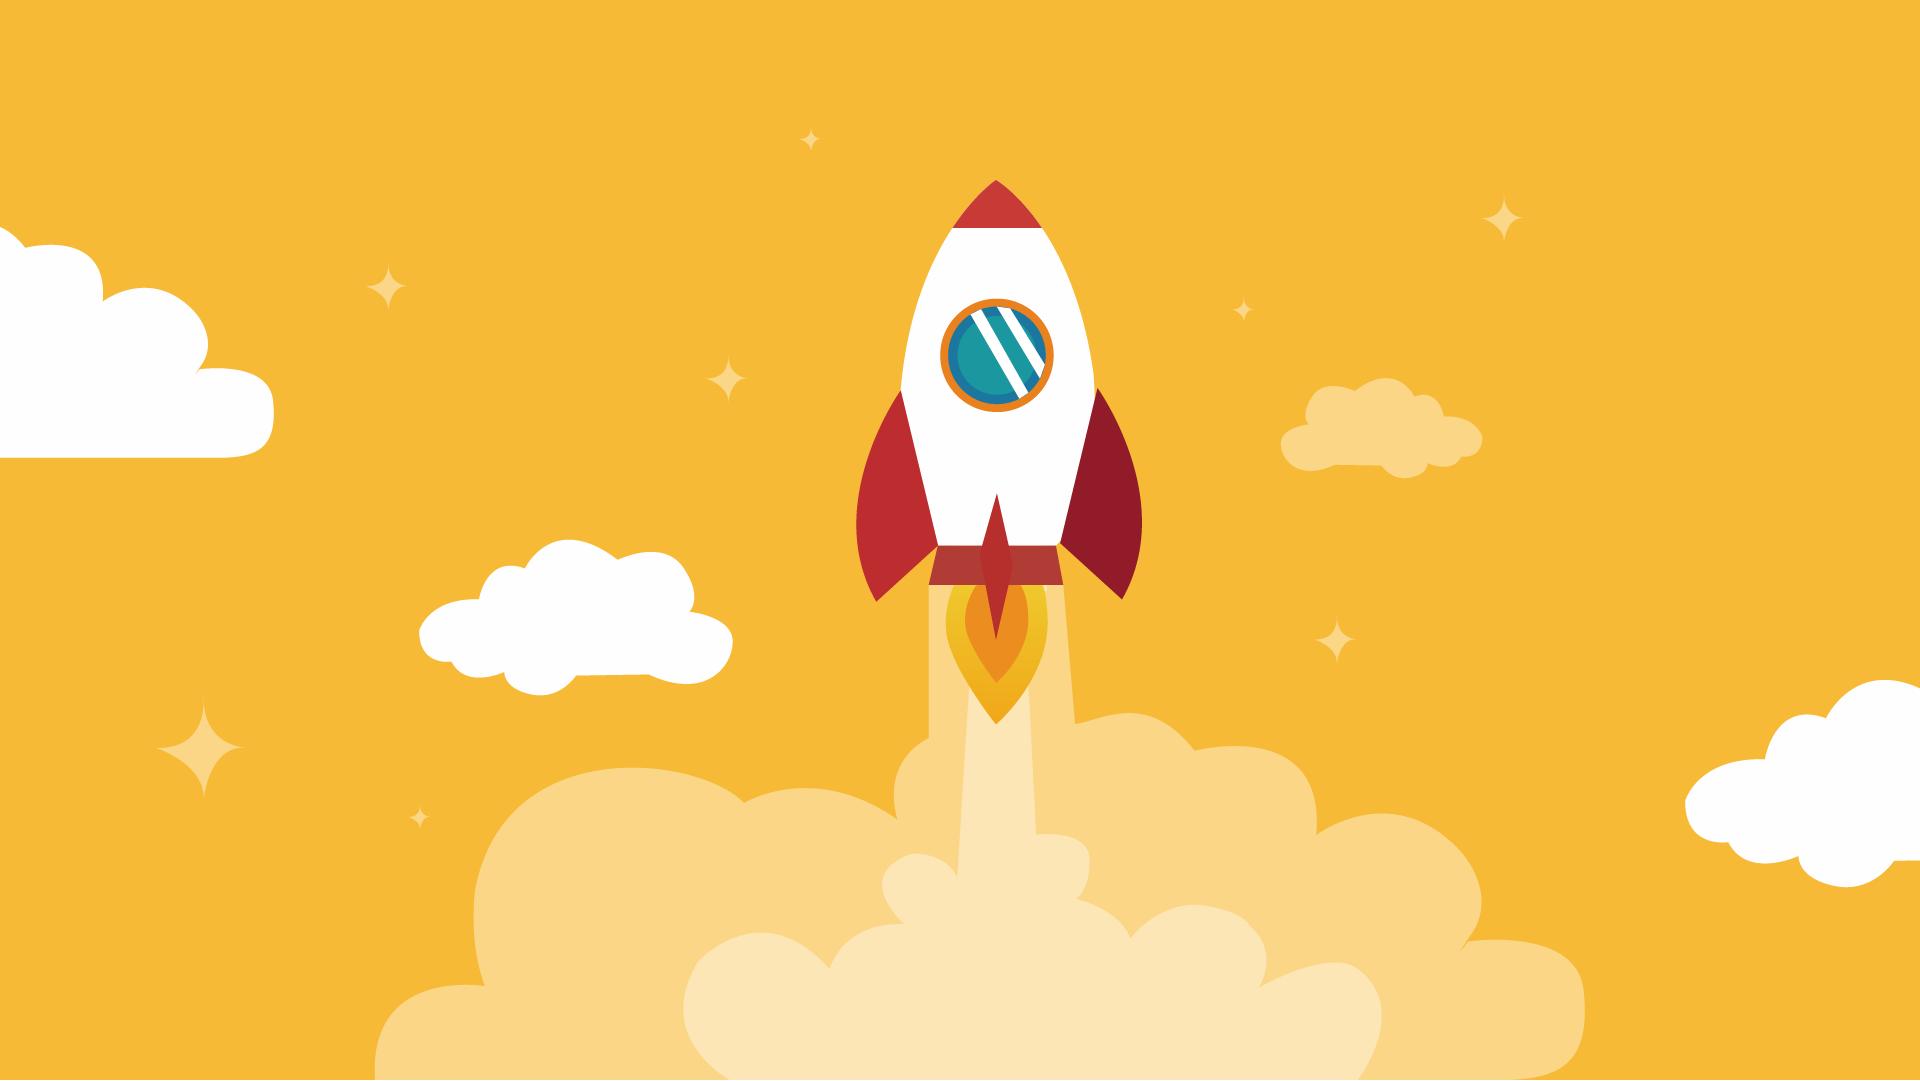 Вебинар PHP и ООП: от новичка до профессионала фото